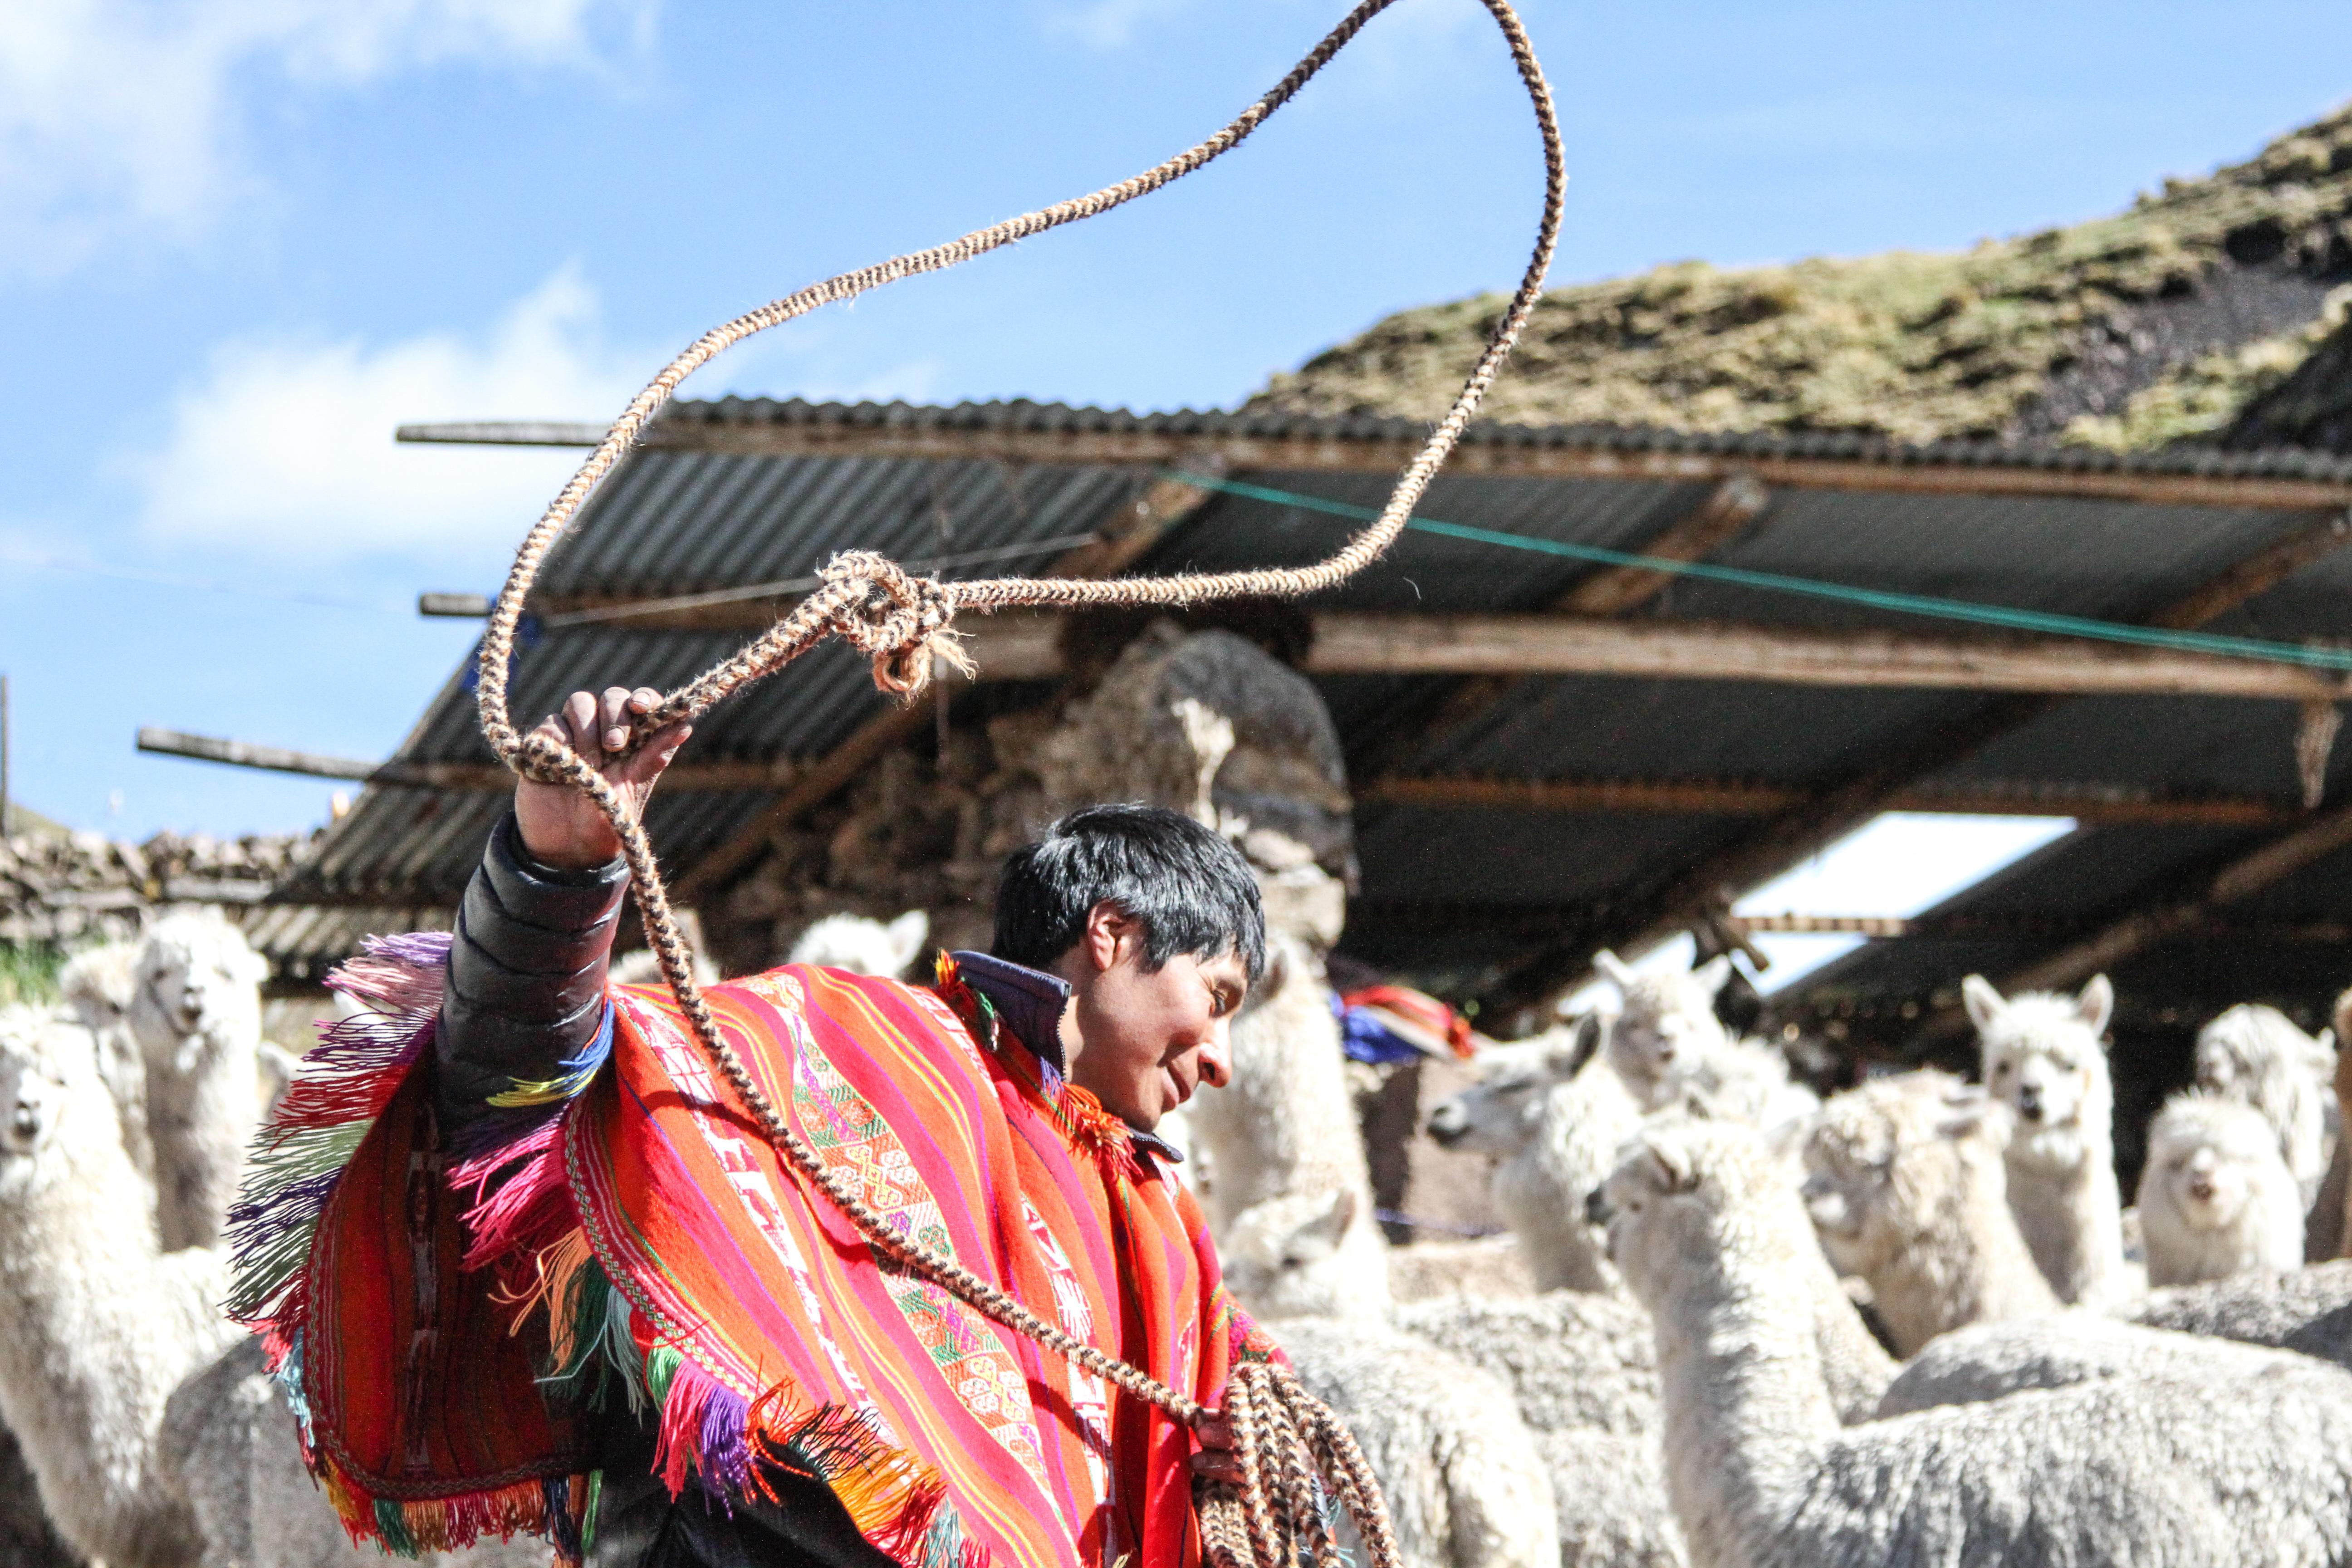 Nest_Peru_Sacred Valley_Alpaca Herder Shearing_Artisans